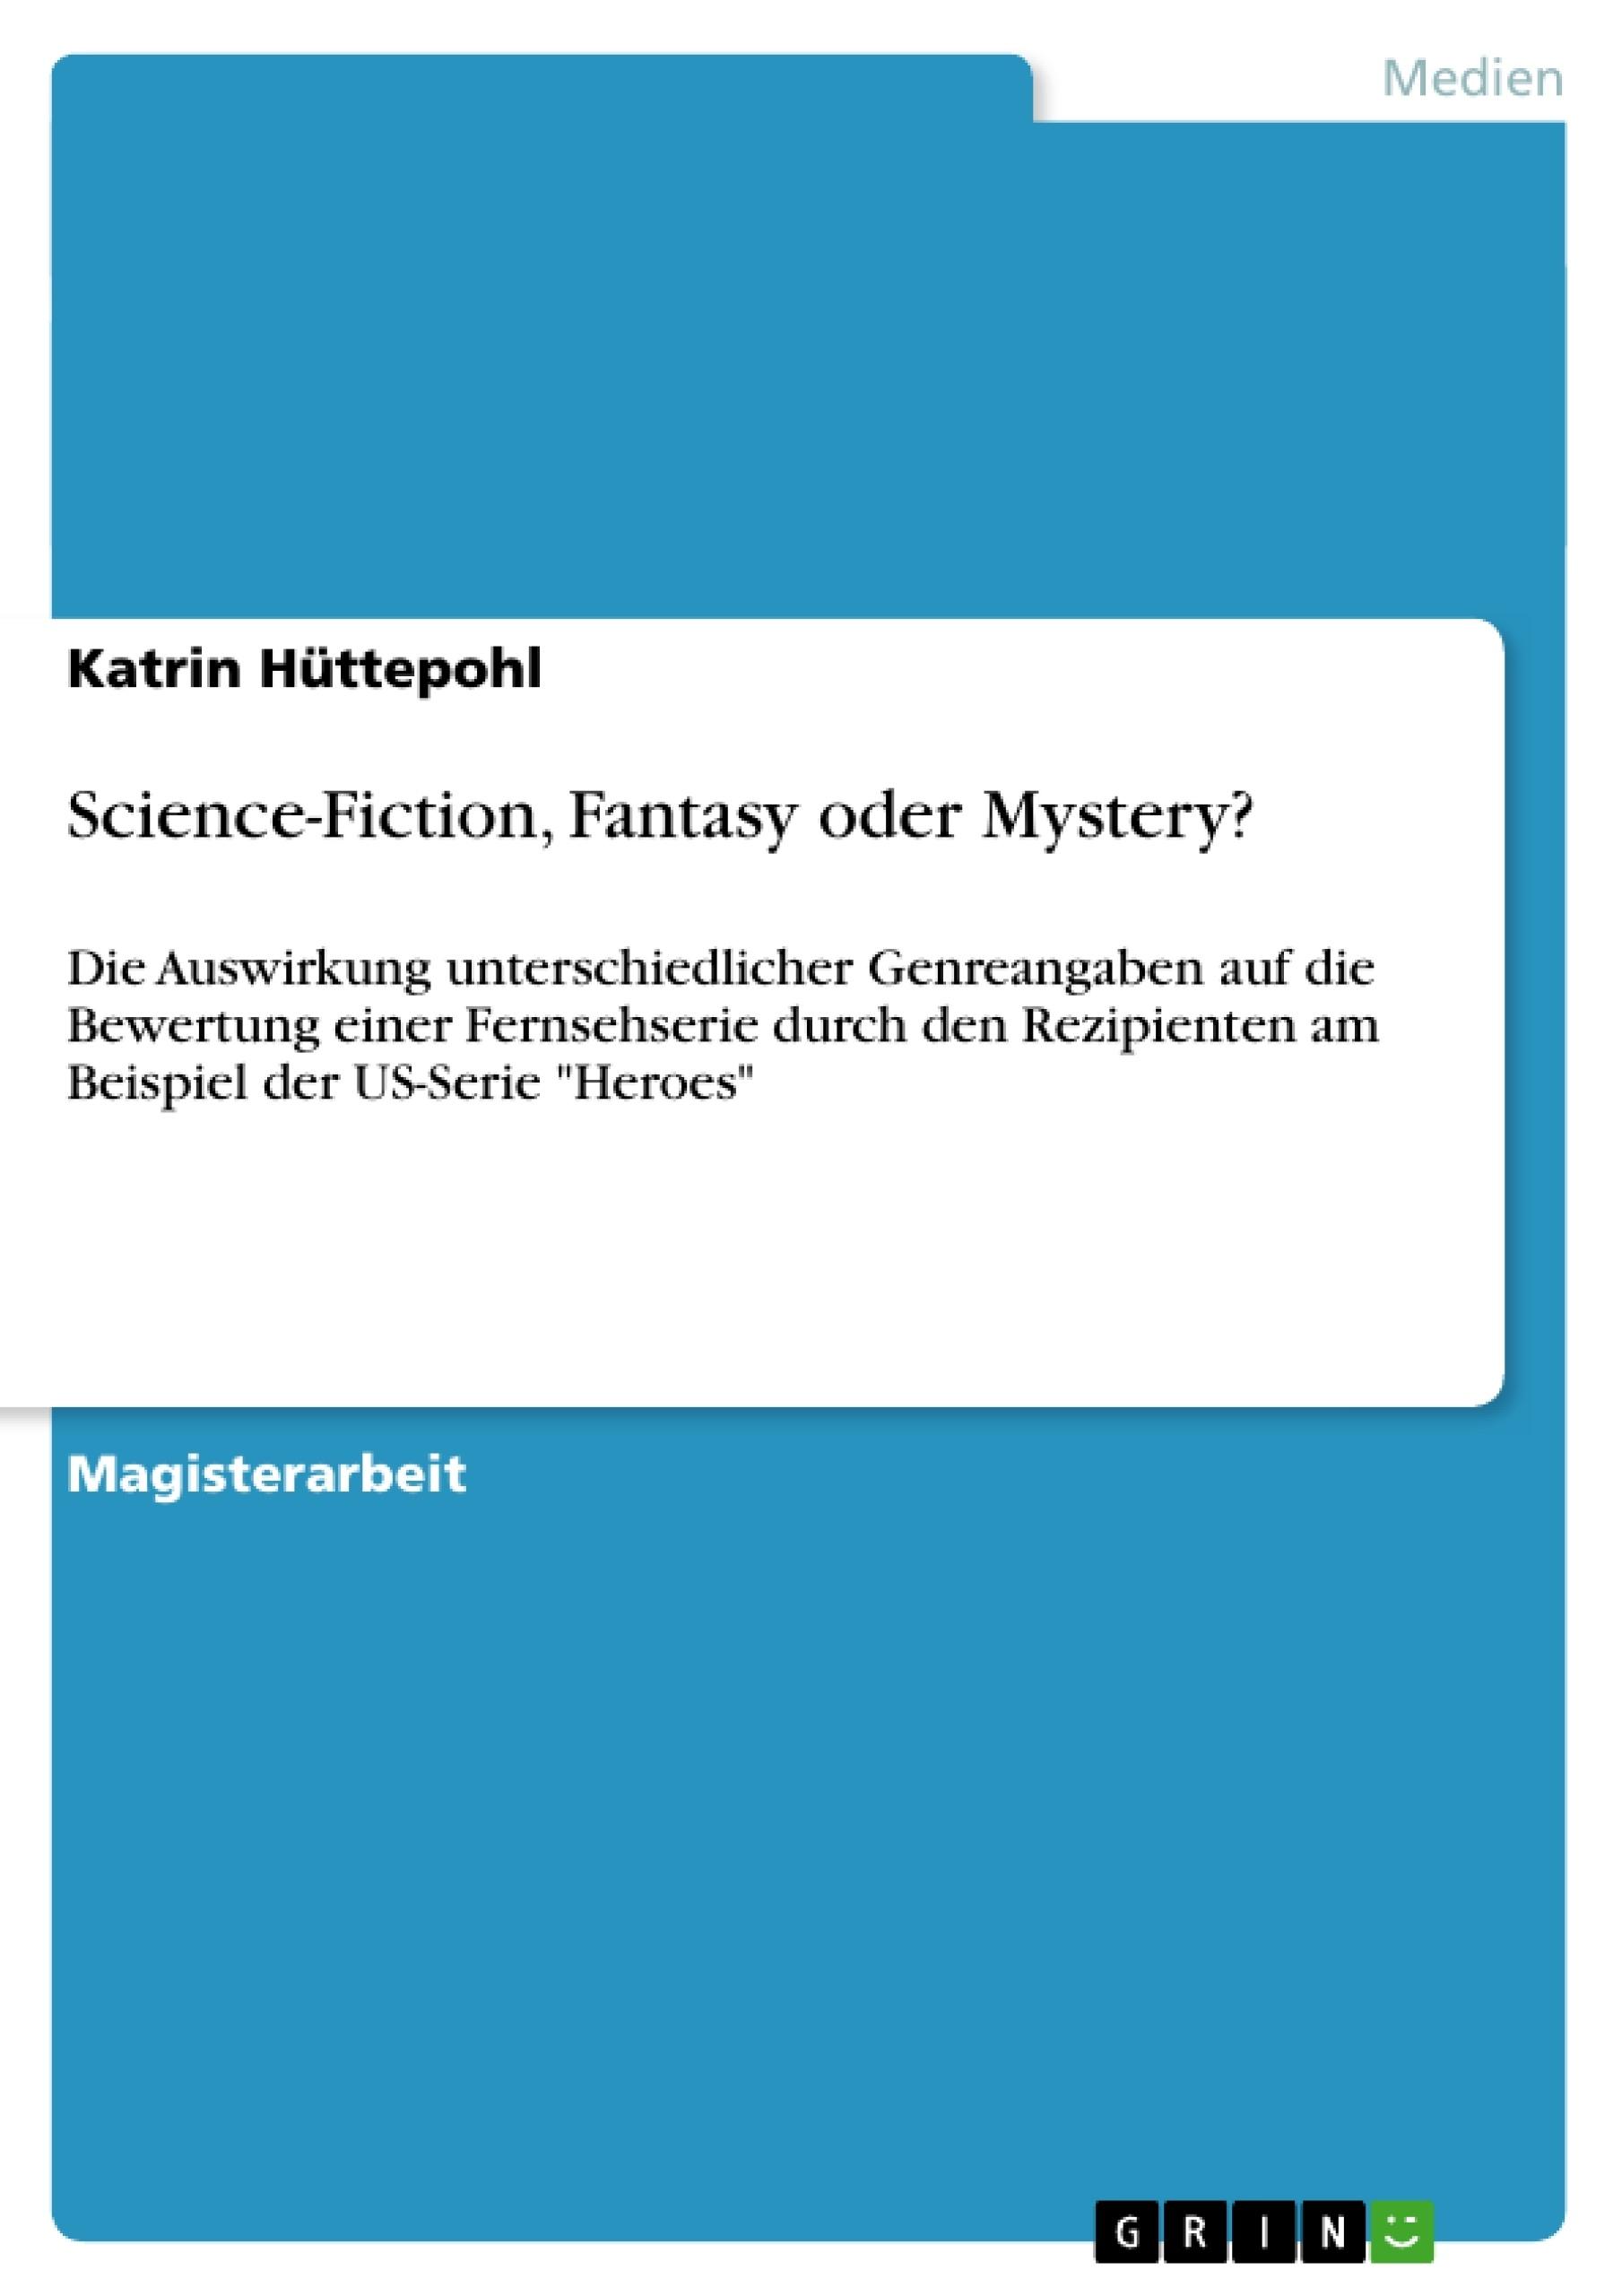 Titel: Science-Fiction, Fantasy oder Mystery?